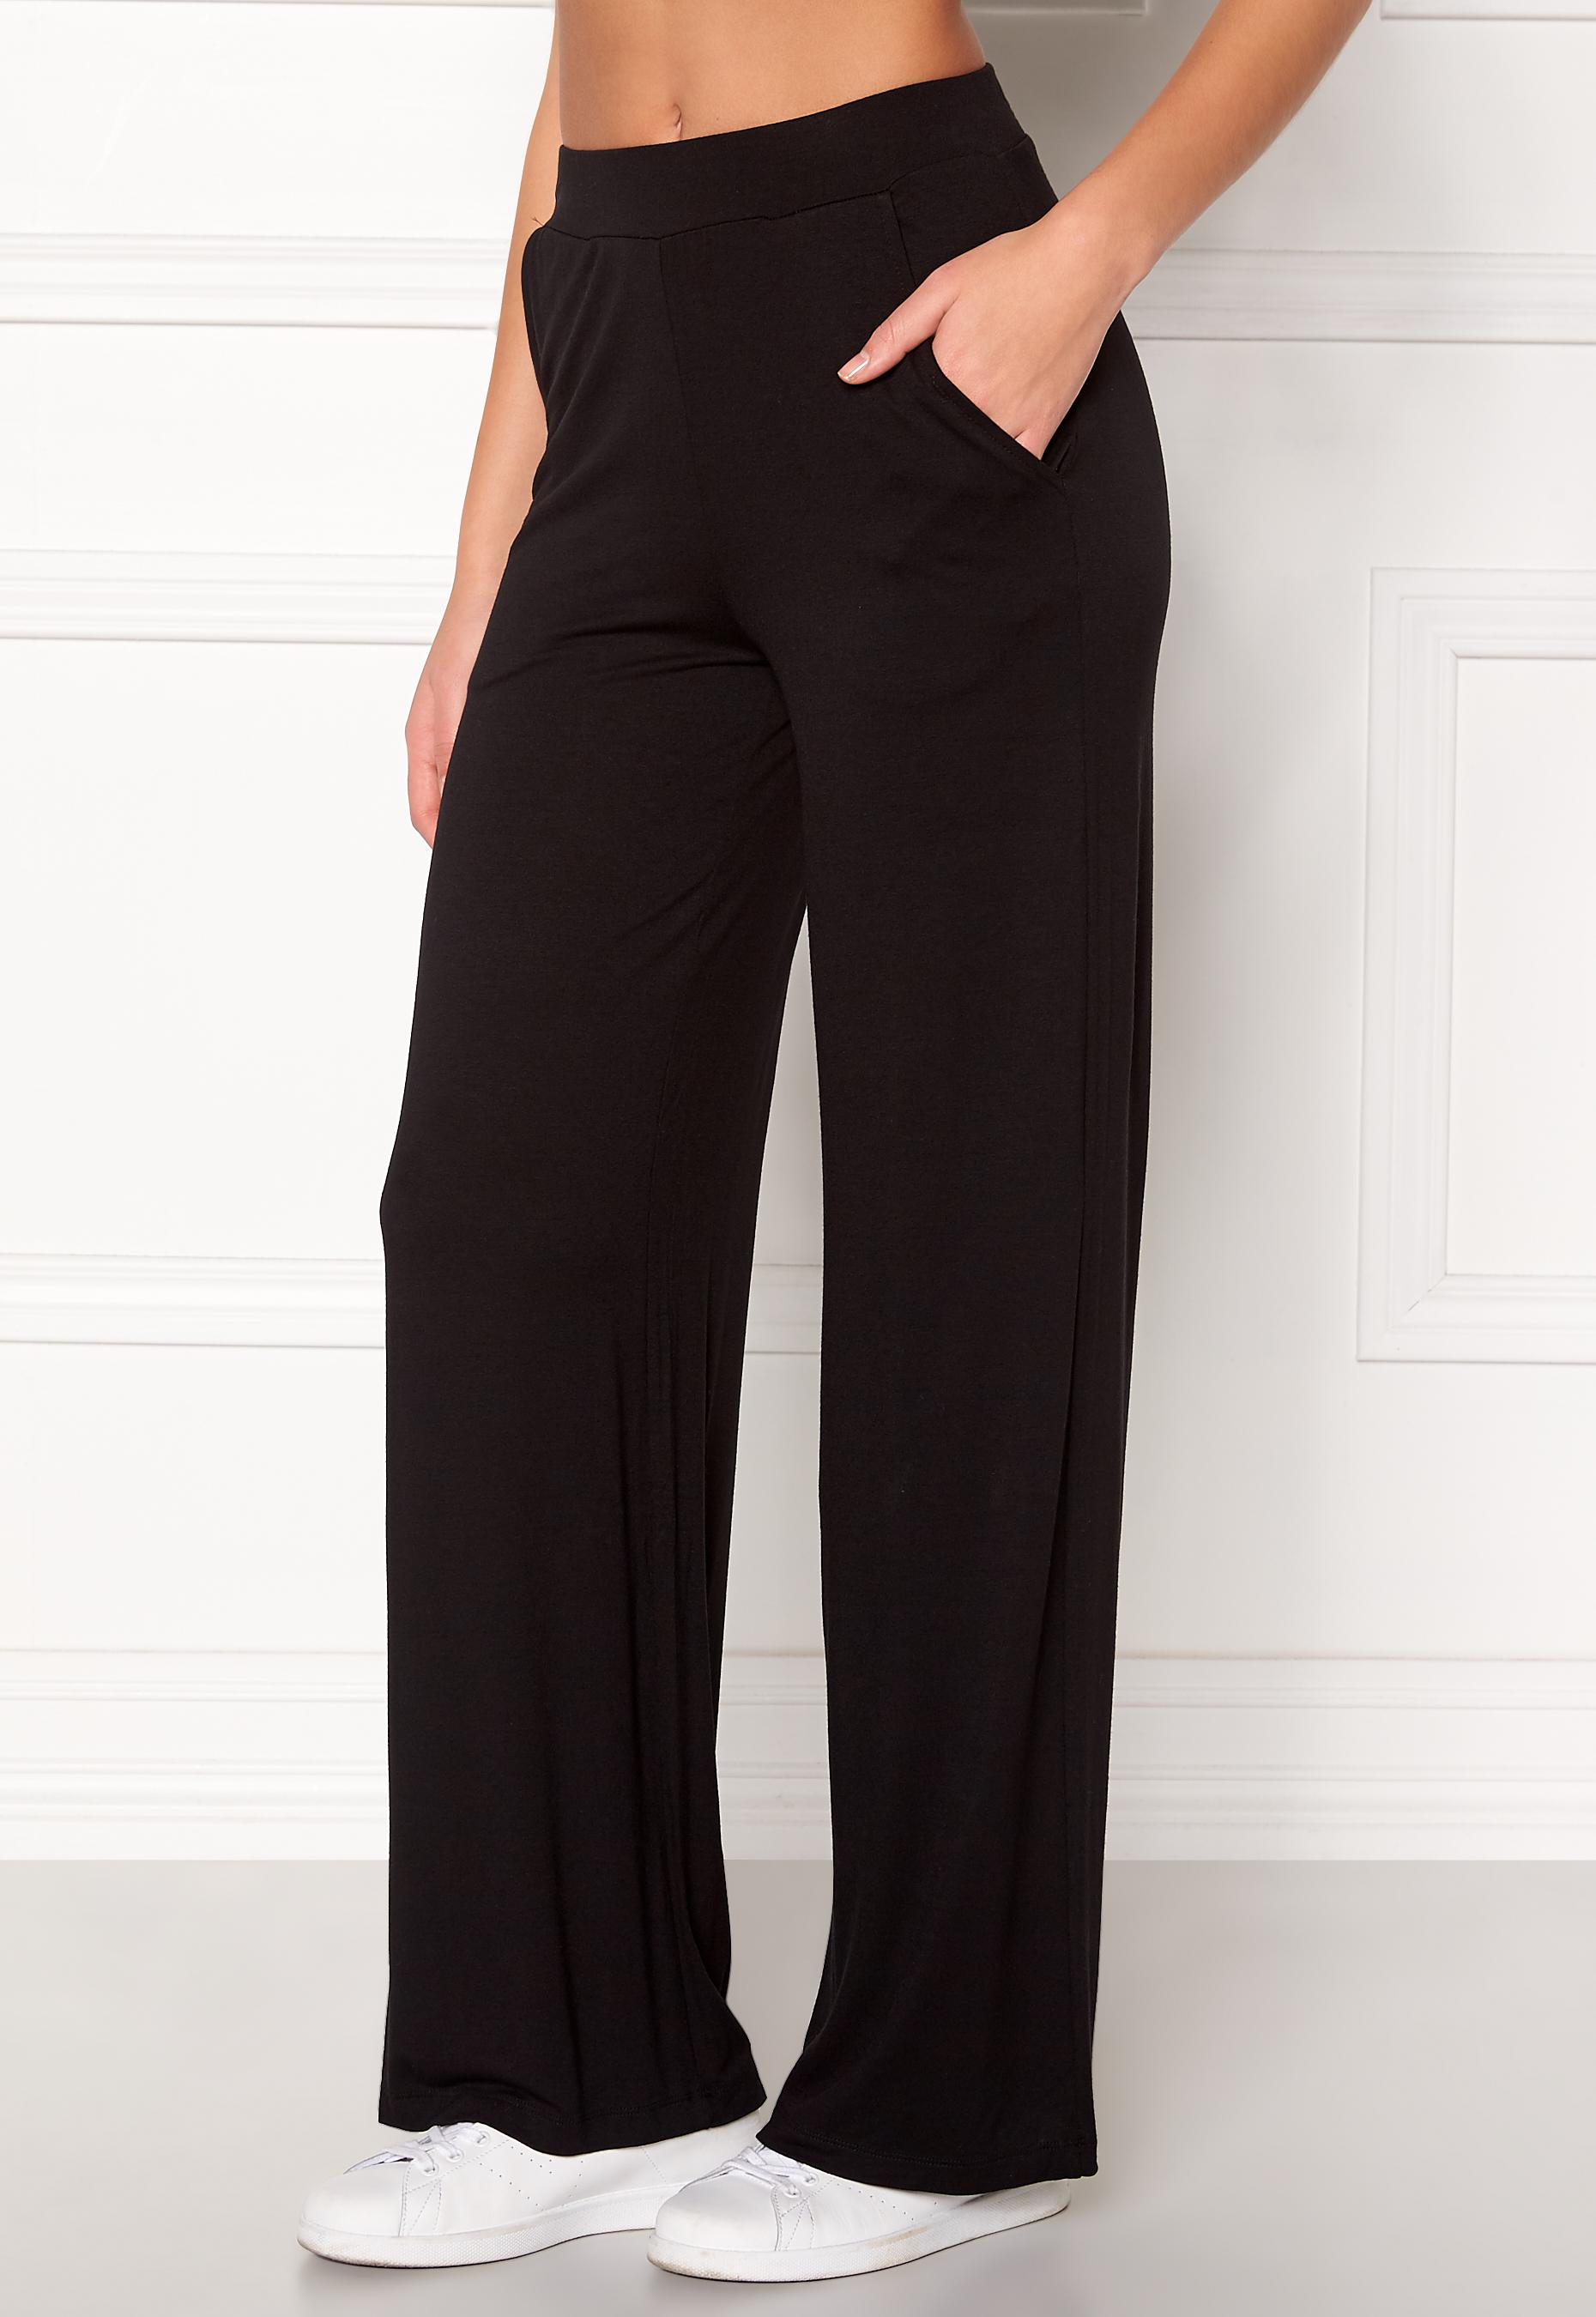 77thFLEA Alanya trousers Black Bubbleroom.se f68f913c27a0f